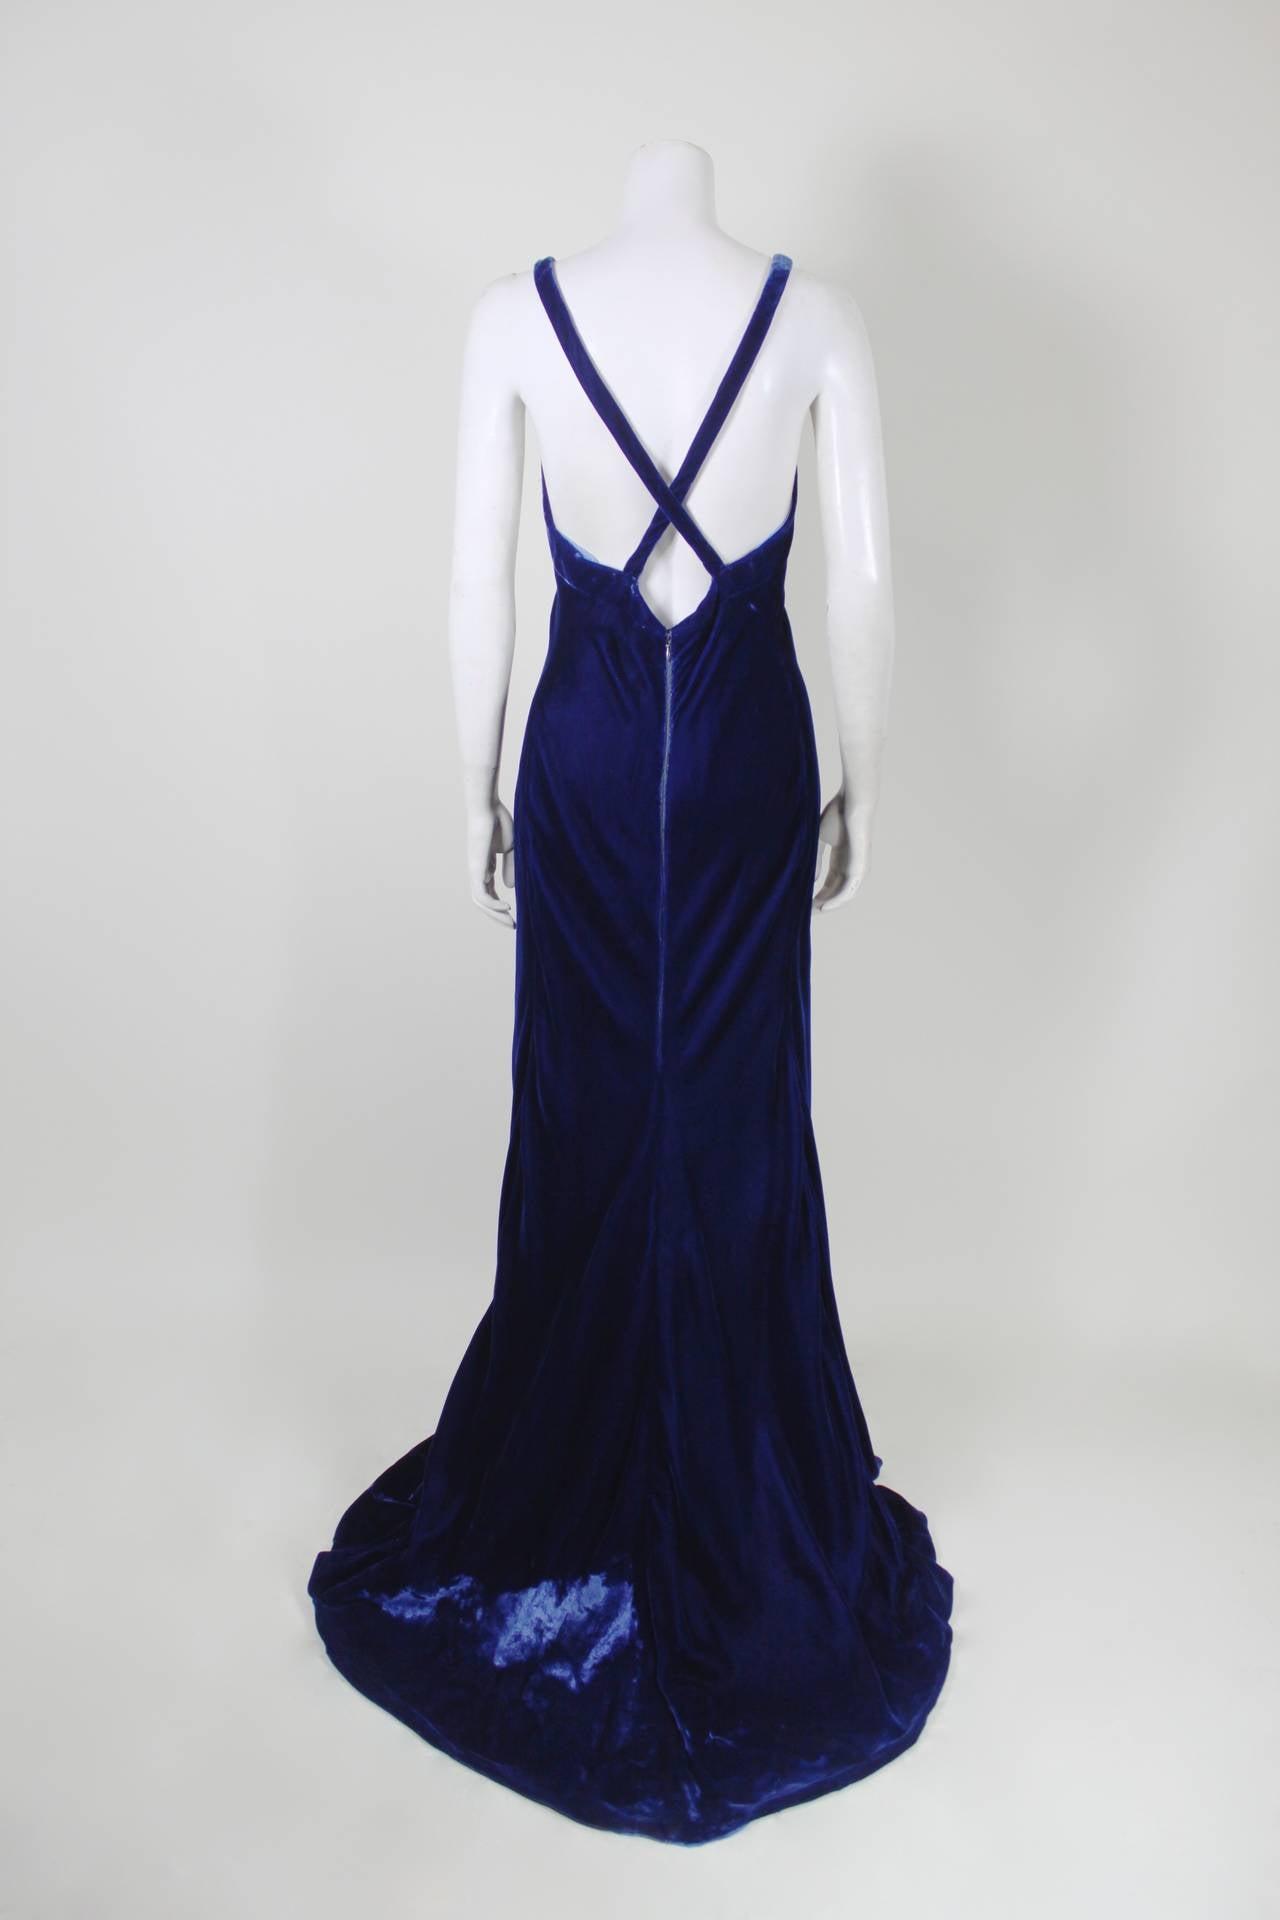 Jacqueline De Ribes Stunning Midnight Blue Velvet Evening Gown For Sale 2